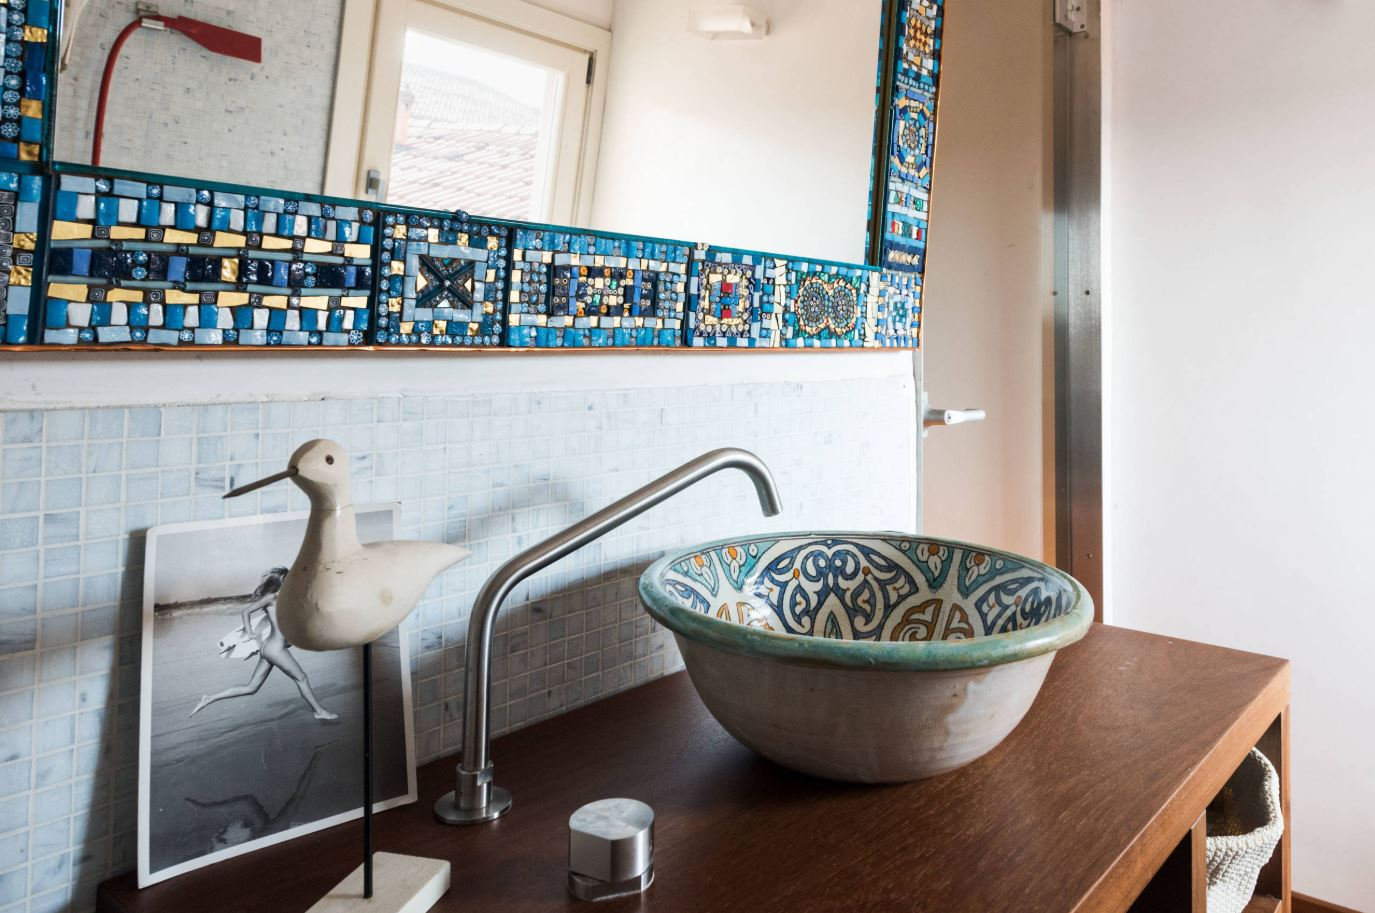 Krome refurbishing-Italian mediterranean interior style-10